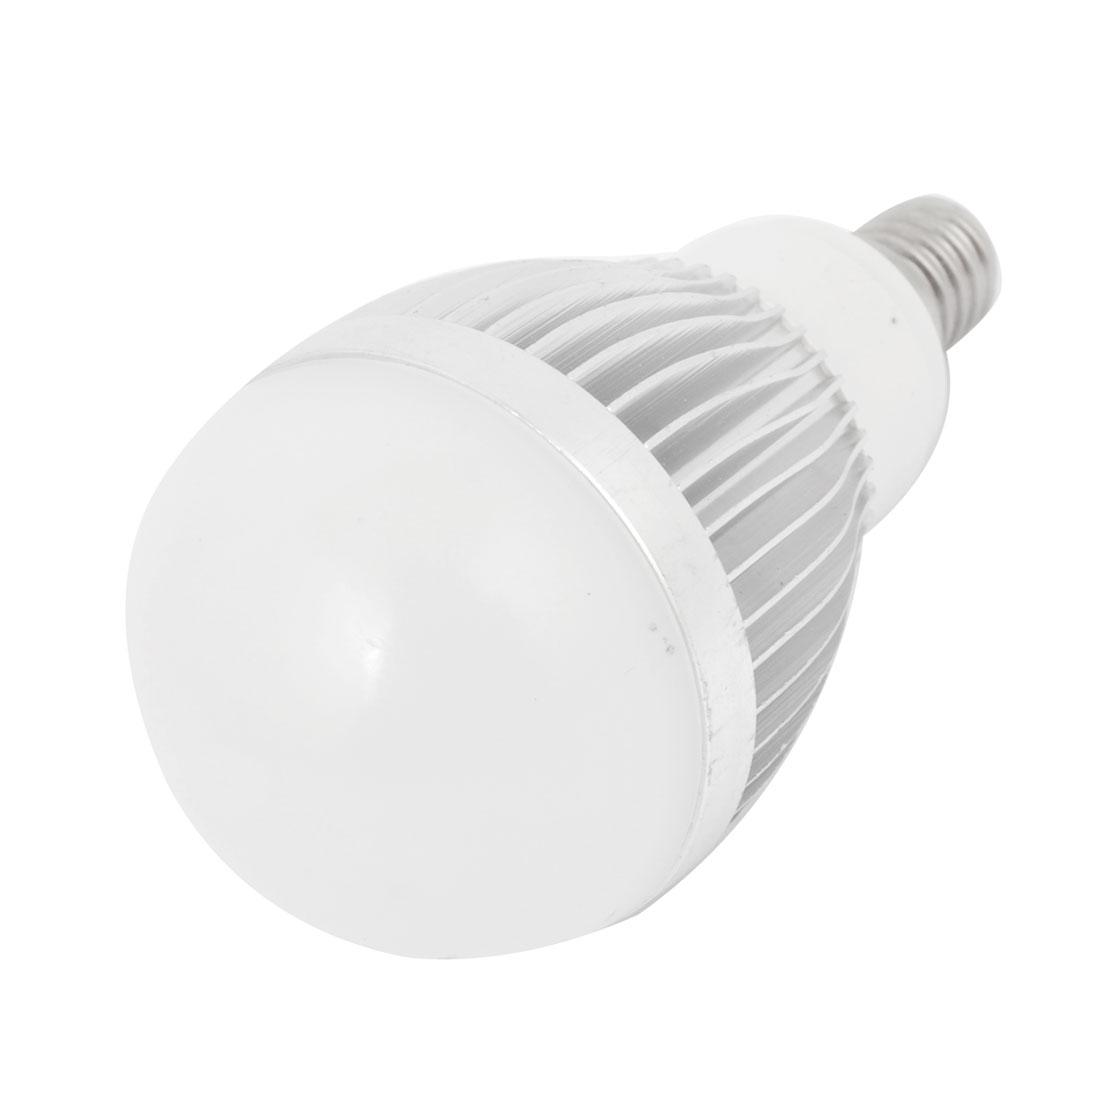 AC 85-220V 1W E14 Screw Base Home Energy Saving Bulb Pure White LED Light Bulb